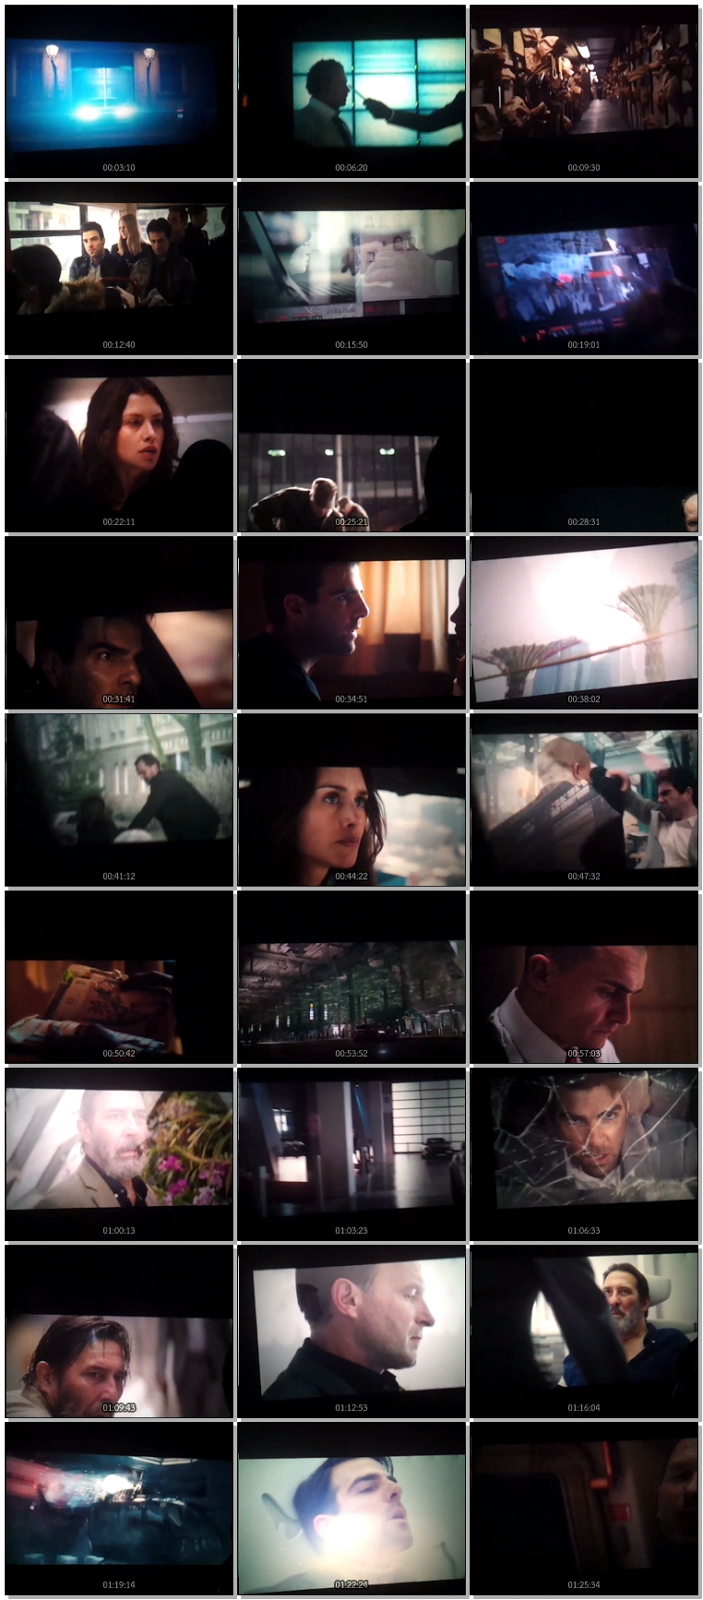 [ZOOM V.1] HITMAN AGENT 47 (2015) ฮิทแมน สายลับ 47 [เสียงไทยโรง + ENG] Hitman.Agent.47.2015.V1.CAM.XviD.AC3.THEATER-Zakky.mkv